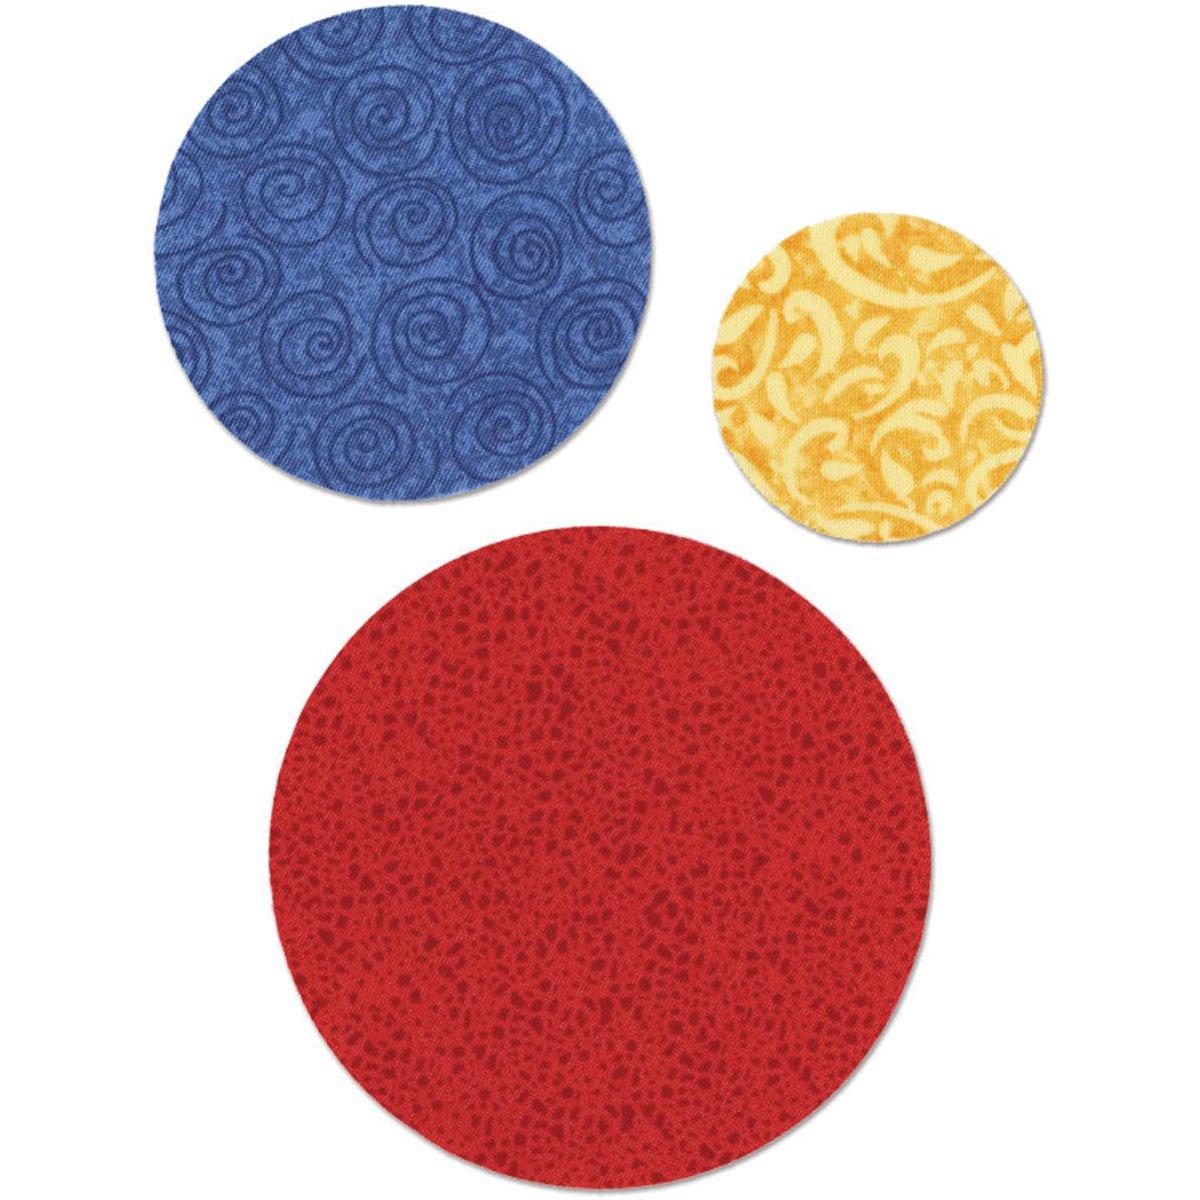 Sizzix Circle Bigz Dies Series, 2-Inch, 3-Inch, 4-Inch